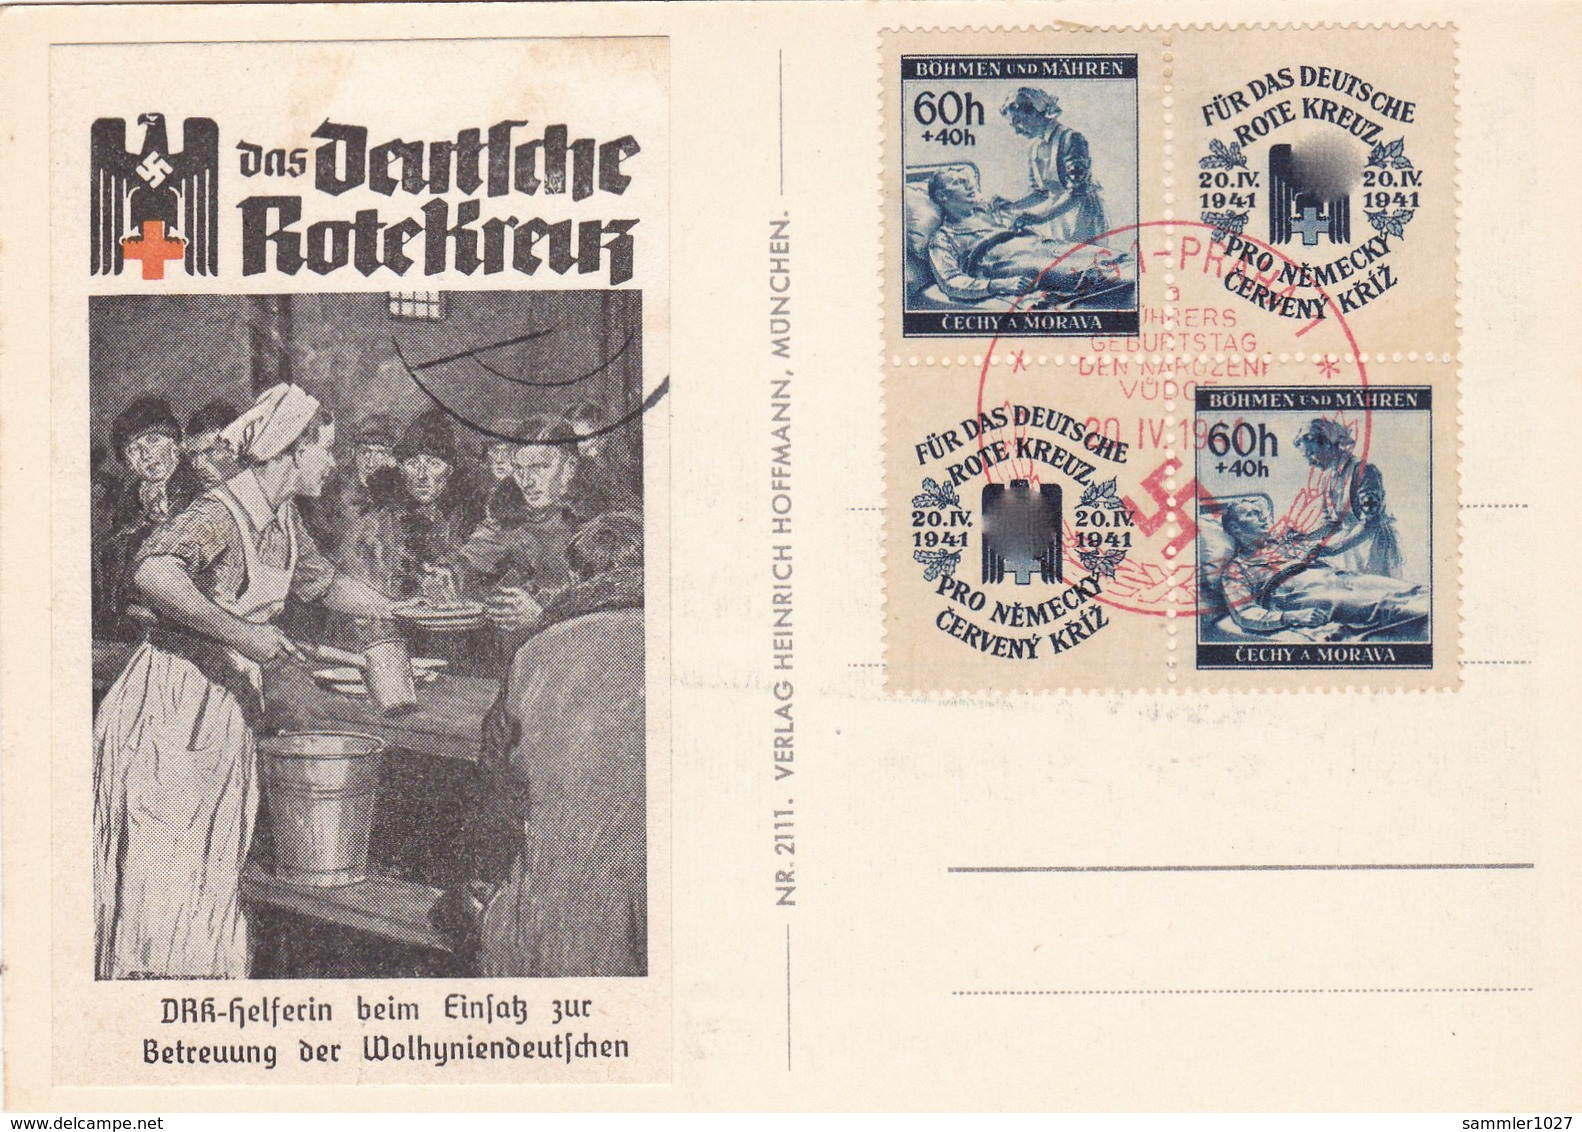 Böhmen Und Mähren Sammlerkarte Aus Prag 1941 - Bohemia & Moravia